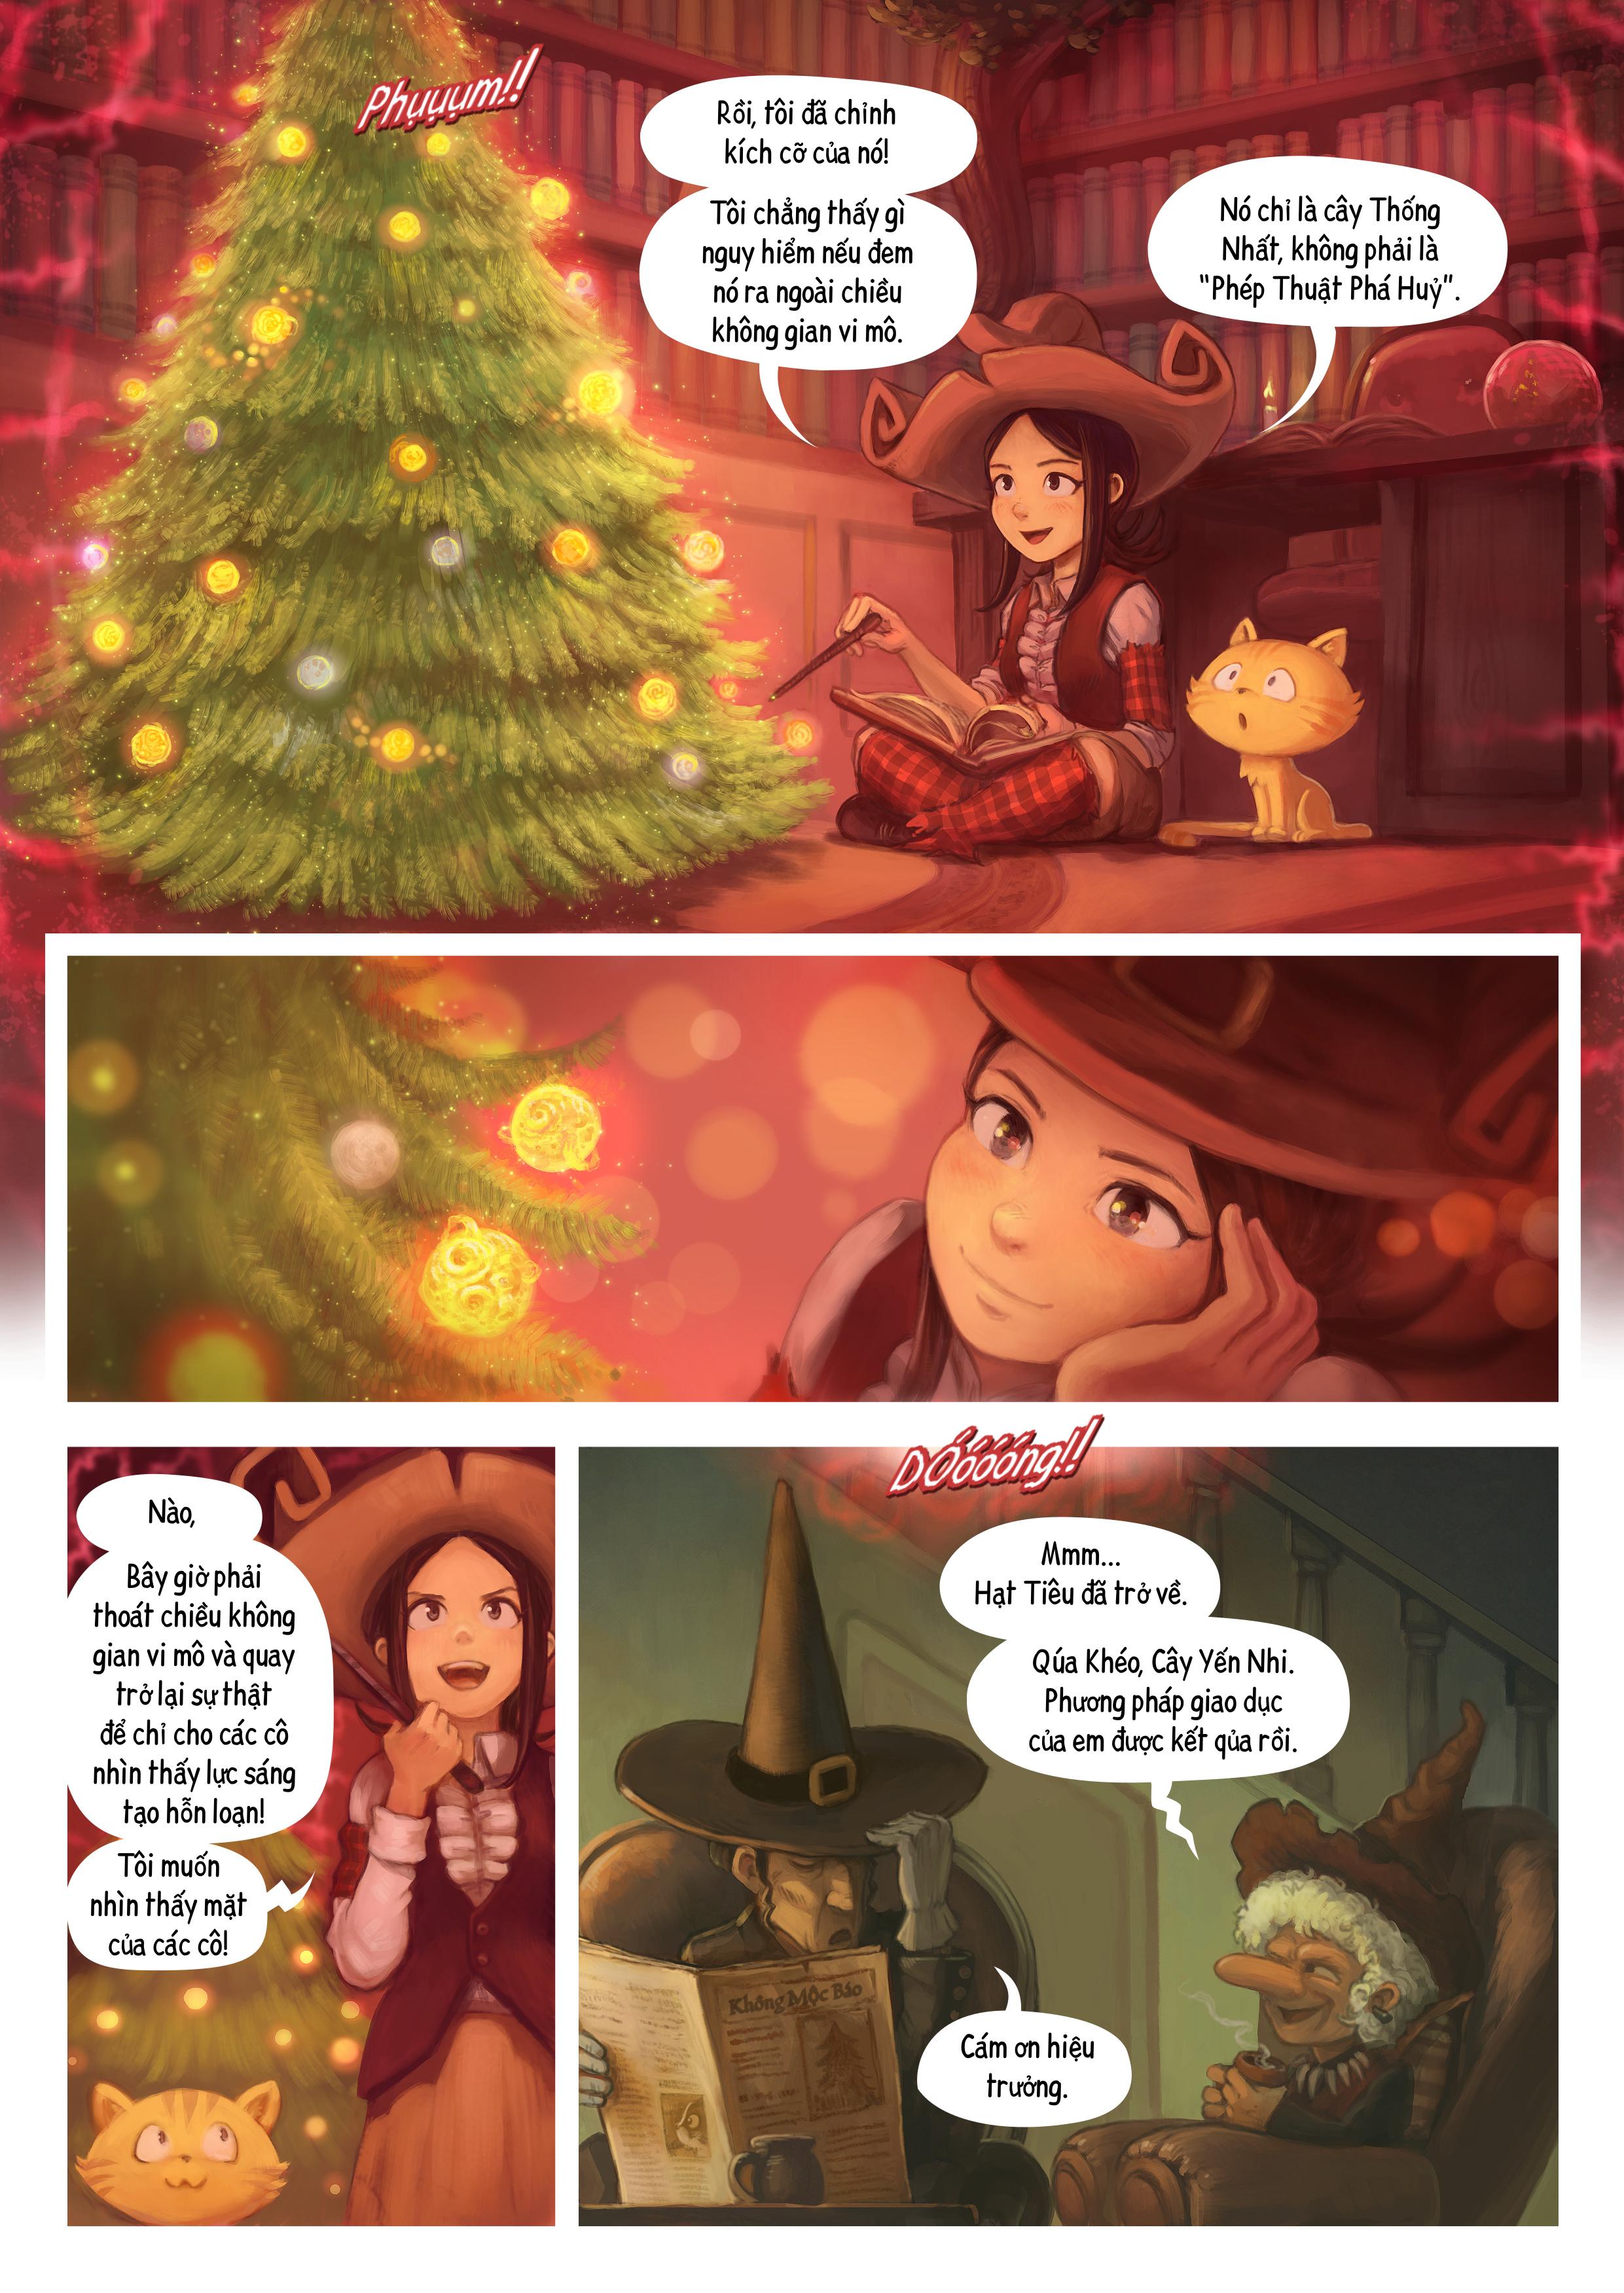 A webcomic page of Pepper&Carrot, Tập 24 [vi], trang 5